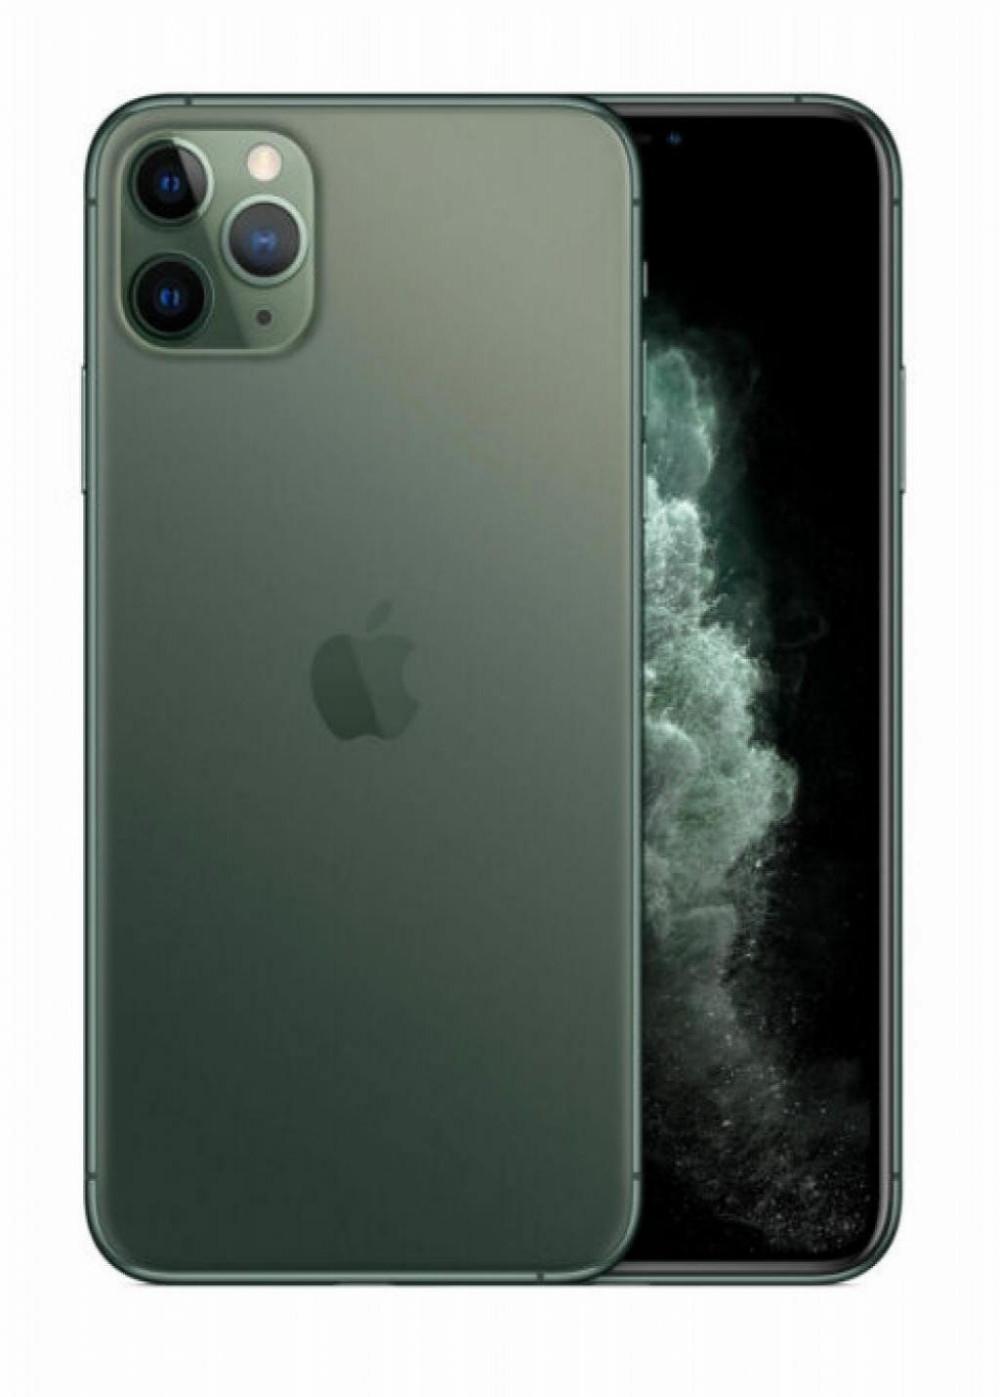 Celular Apple Iphone 11 Pro Max 256GB A2161 Verde